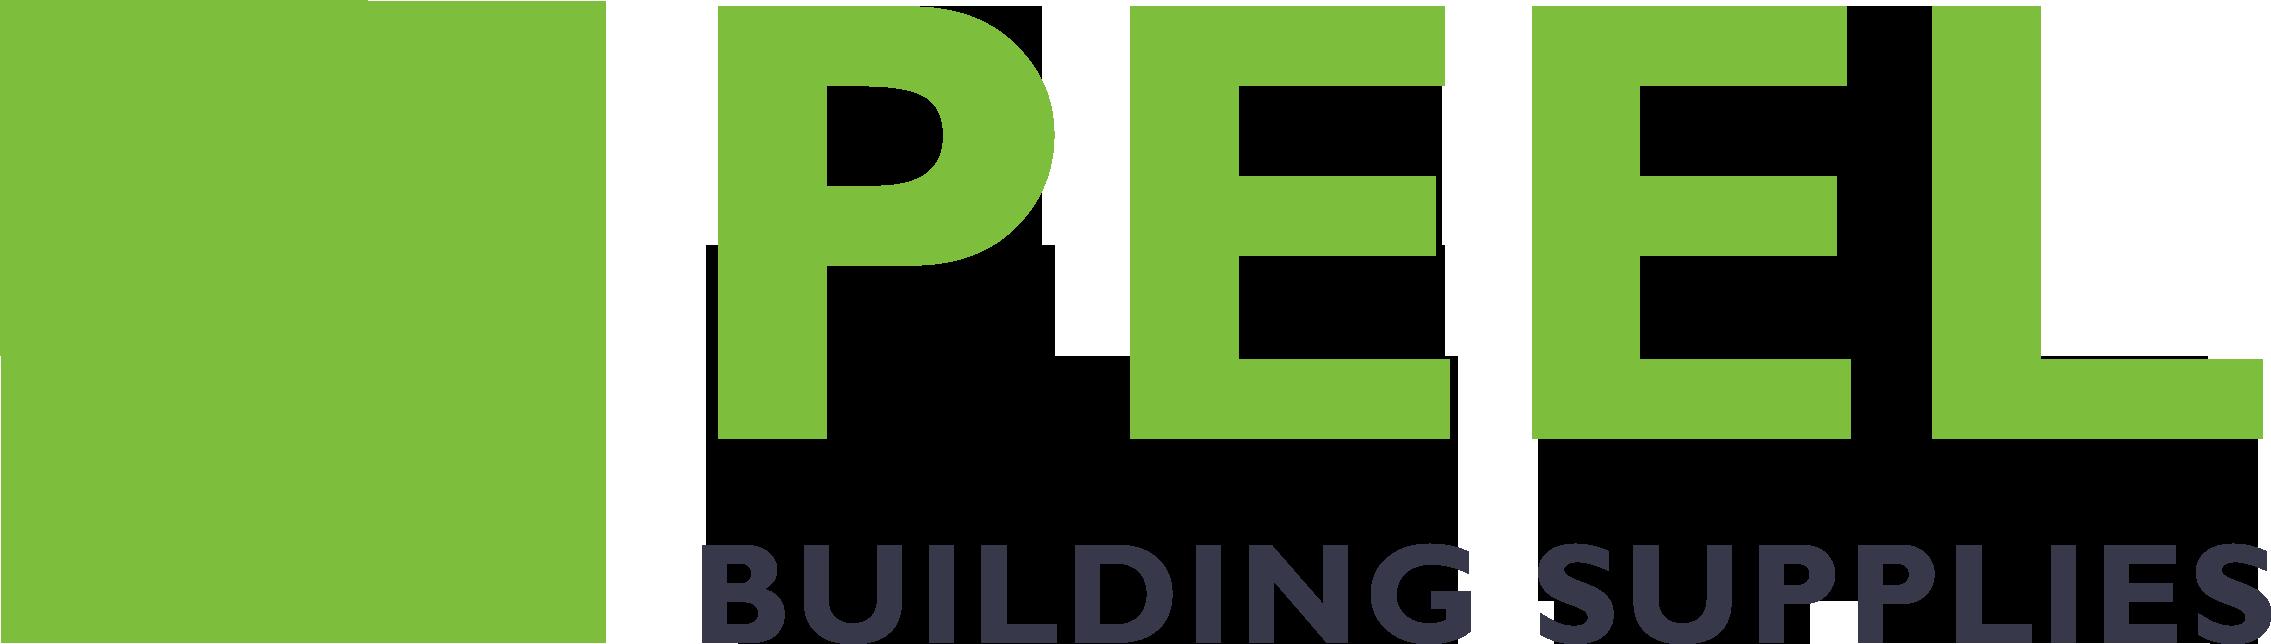 Peel Building Supplies Logo